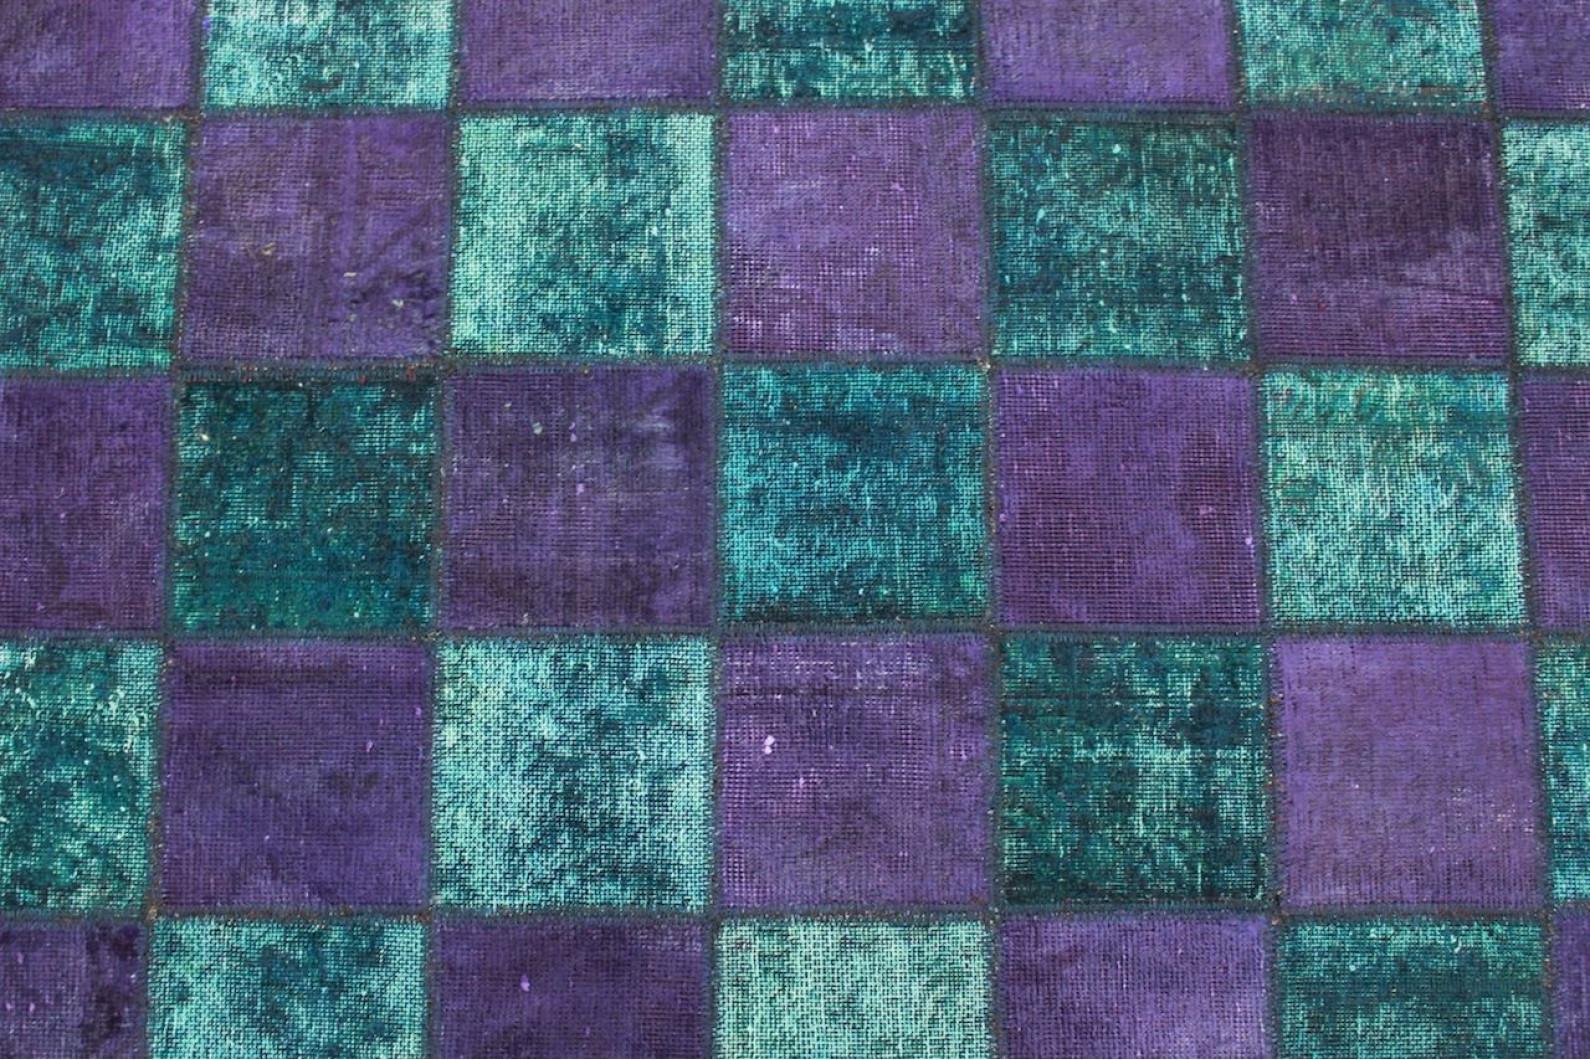 Patchwork Teppich Lila Türkis In 200x140cm 1001 2676 Bei Carpetido